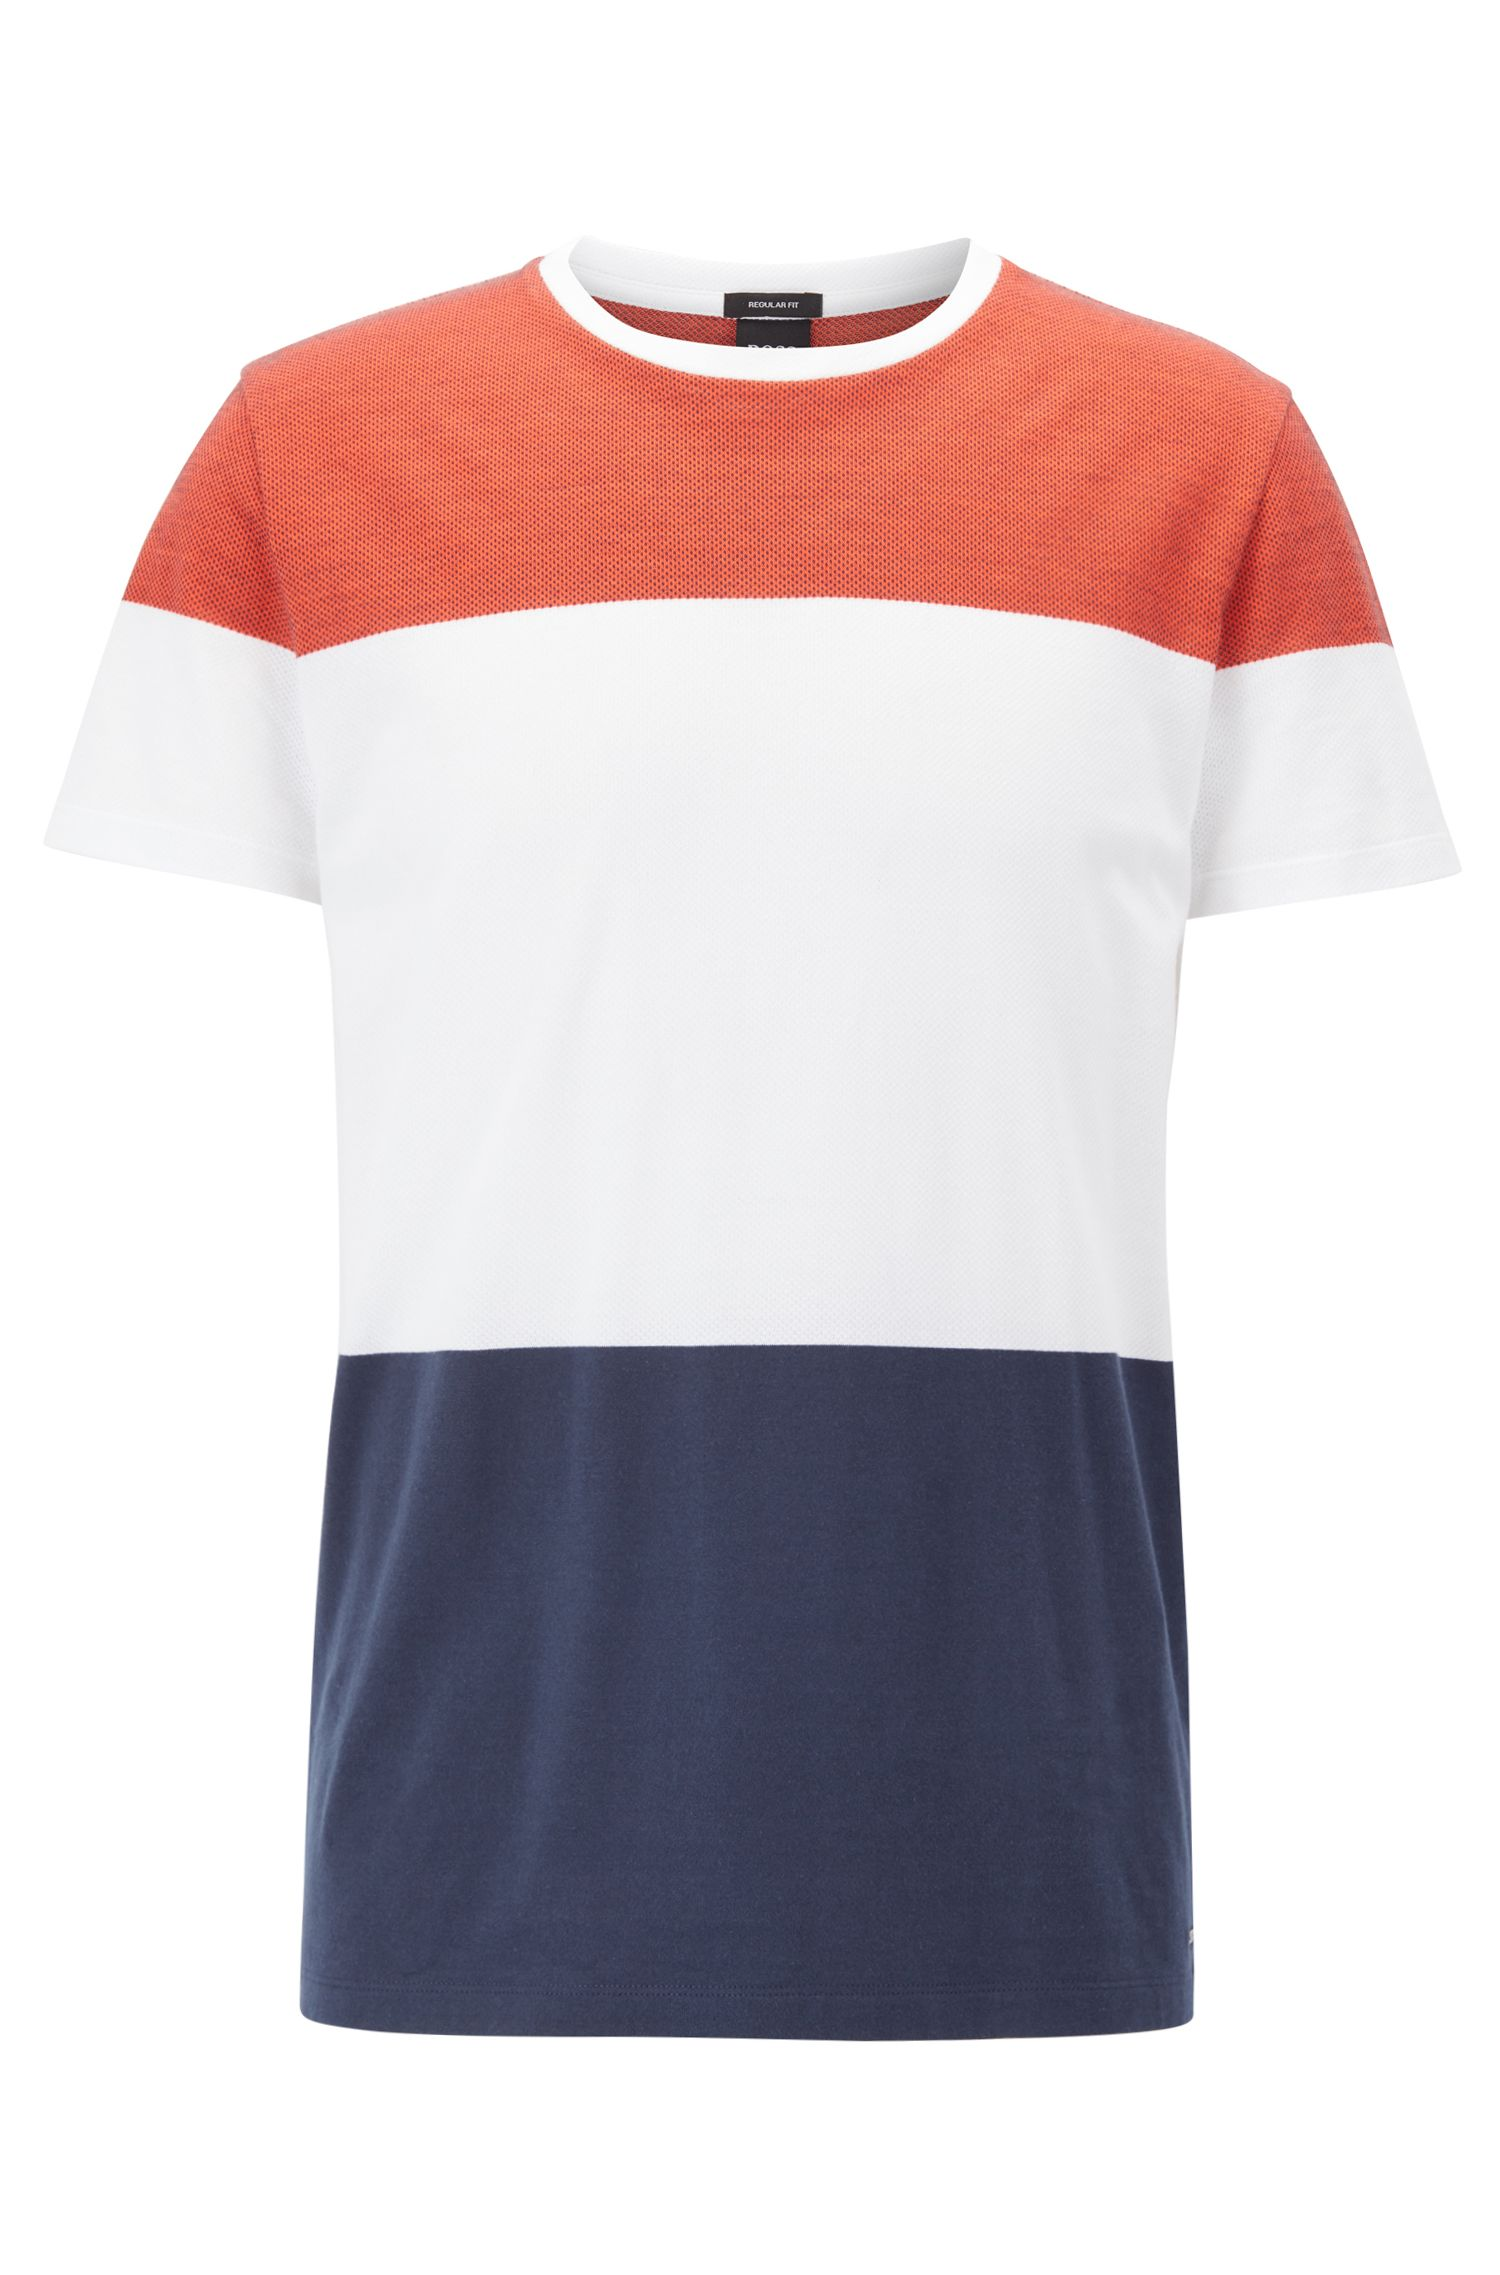 Colorblocked Cotton T-Shirt | Tiburt